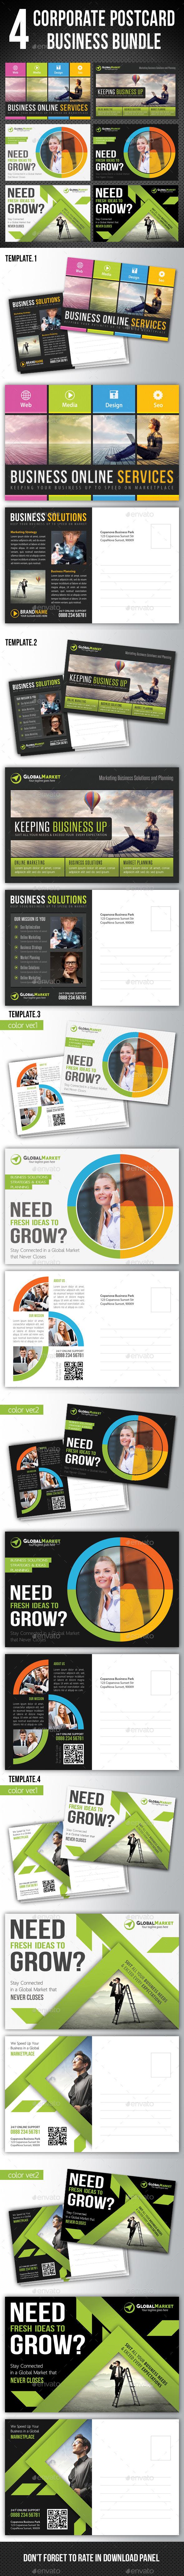 4 in 1 Corporate Business Postcard Bundle V01 - Cards & Invites Print Templates